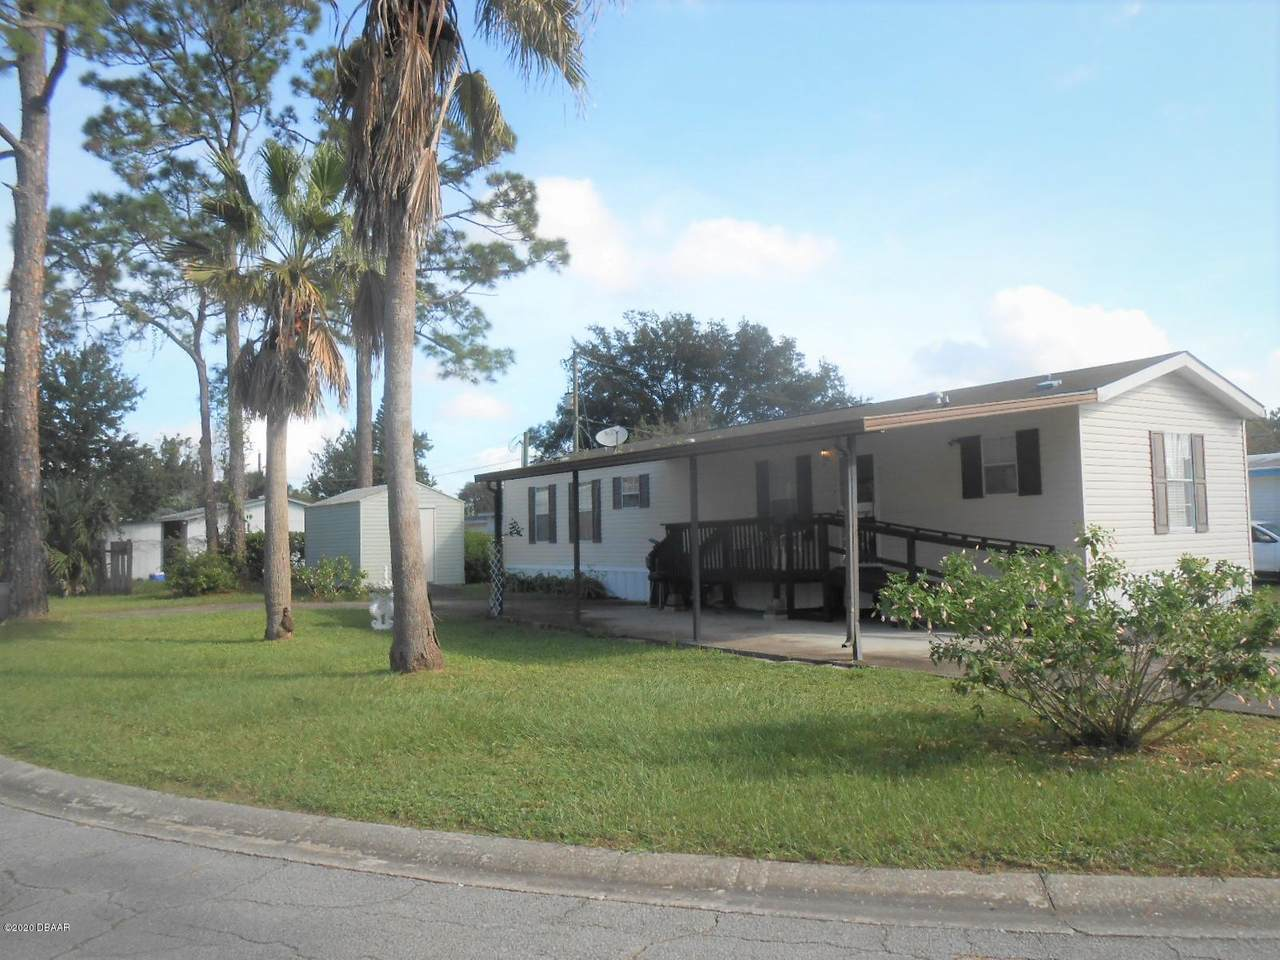 1805 Sunny Palm Drive - Photo 1